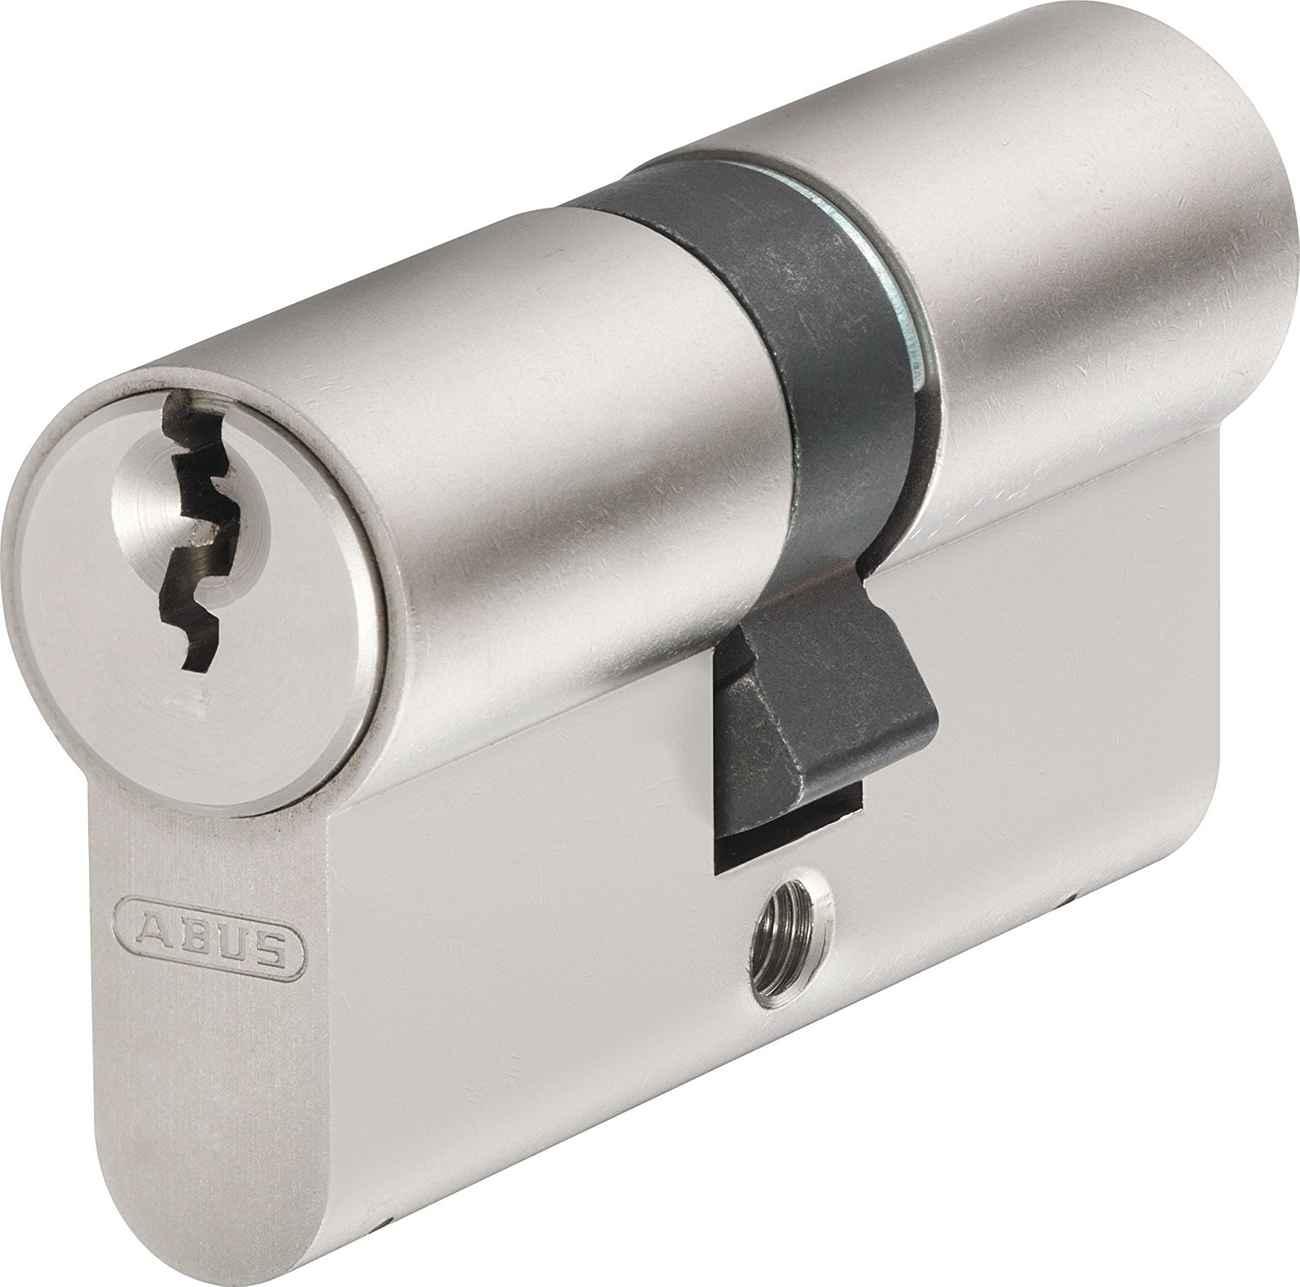 Abus Profilzylinder D6X 35/40 mm, 5 Schlüssel, Codekarte